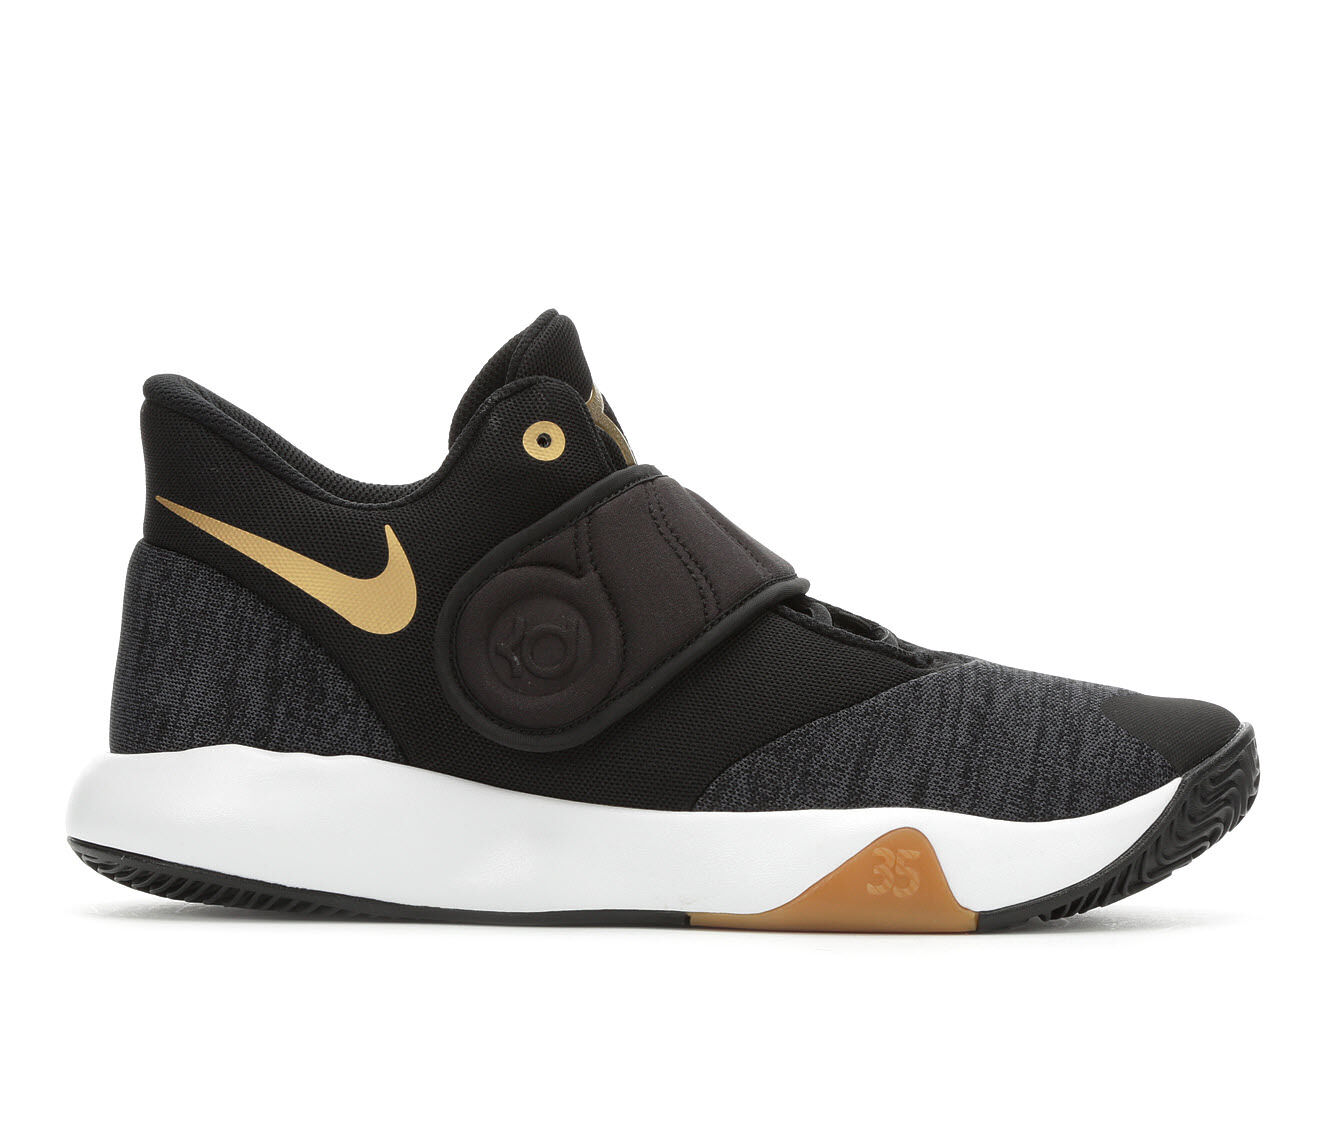 Men's Nike KD Trey 5 VI High Top Basketball Shoes Blk/Gold/Wht